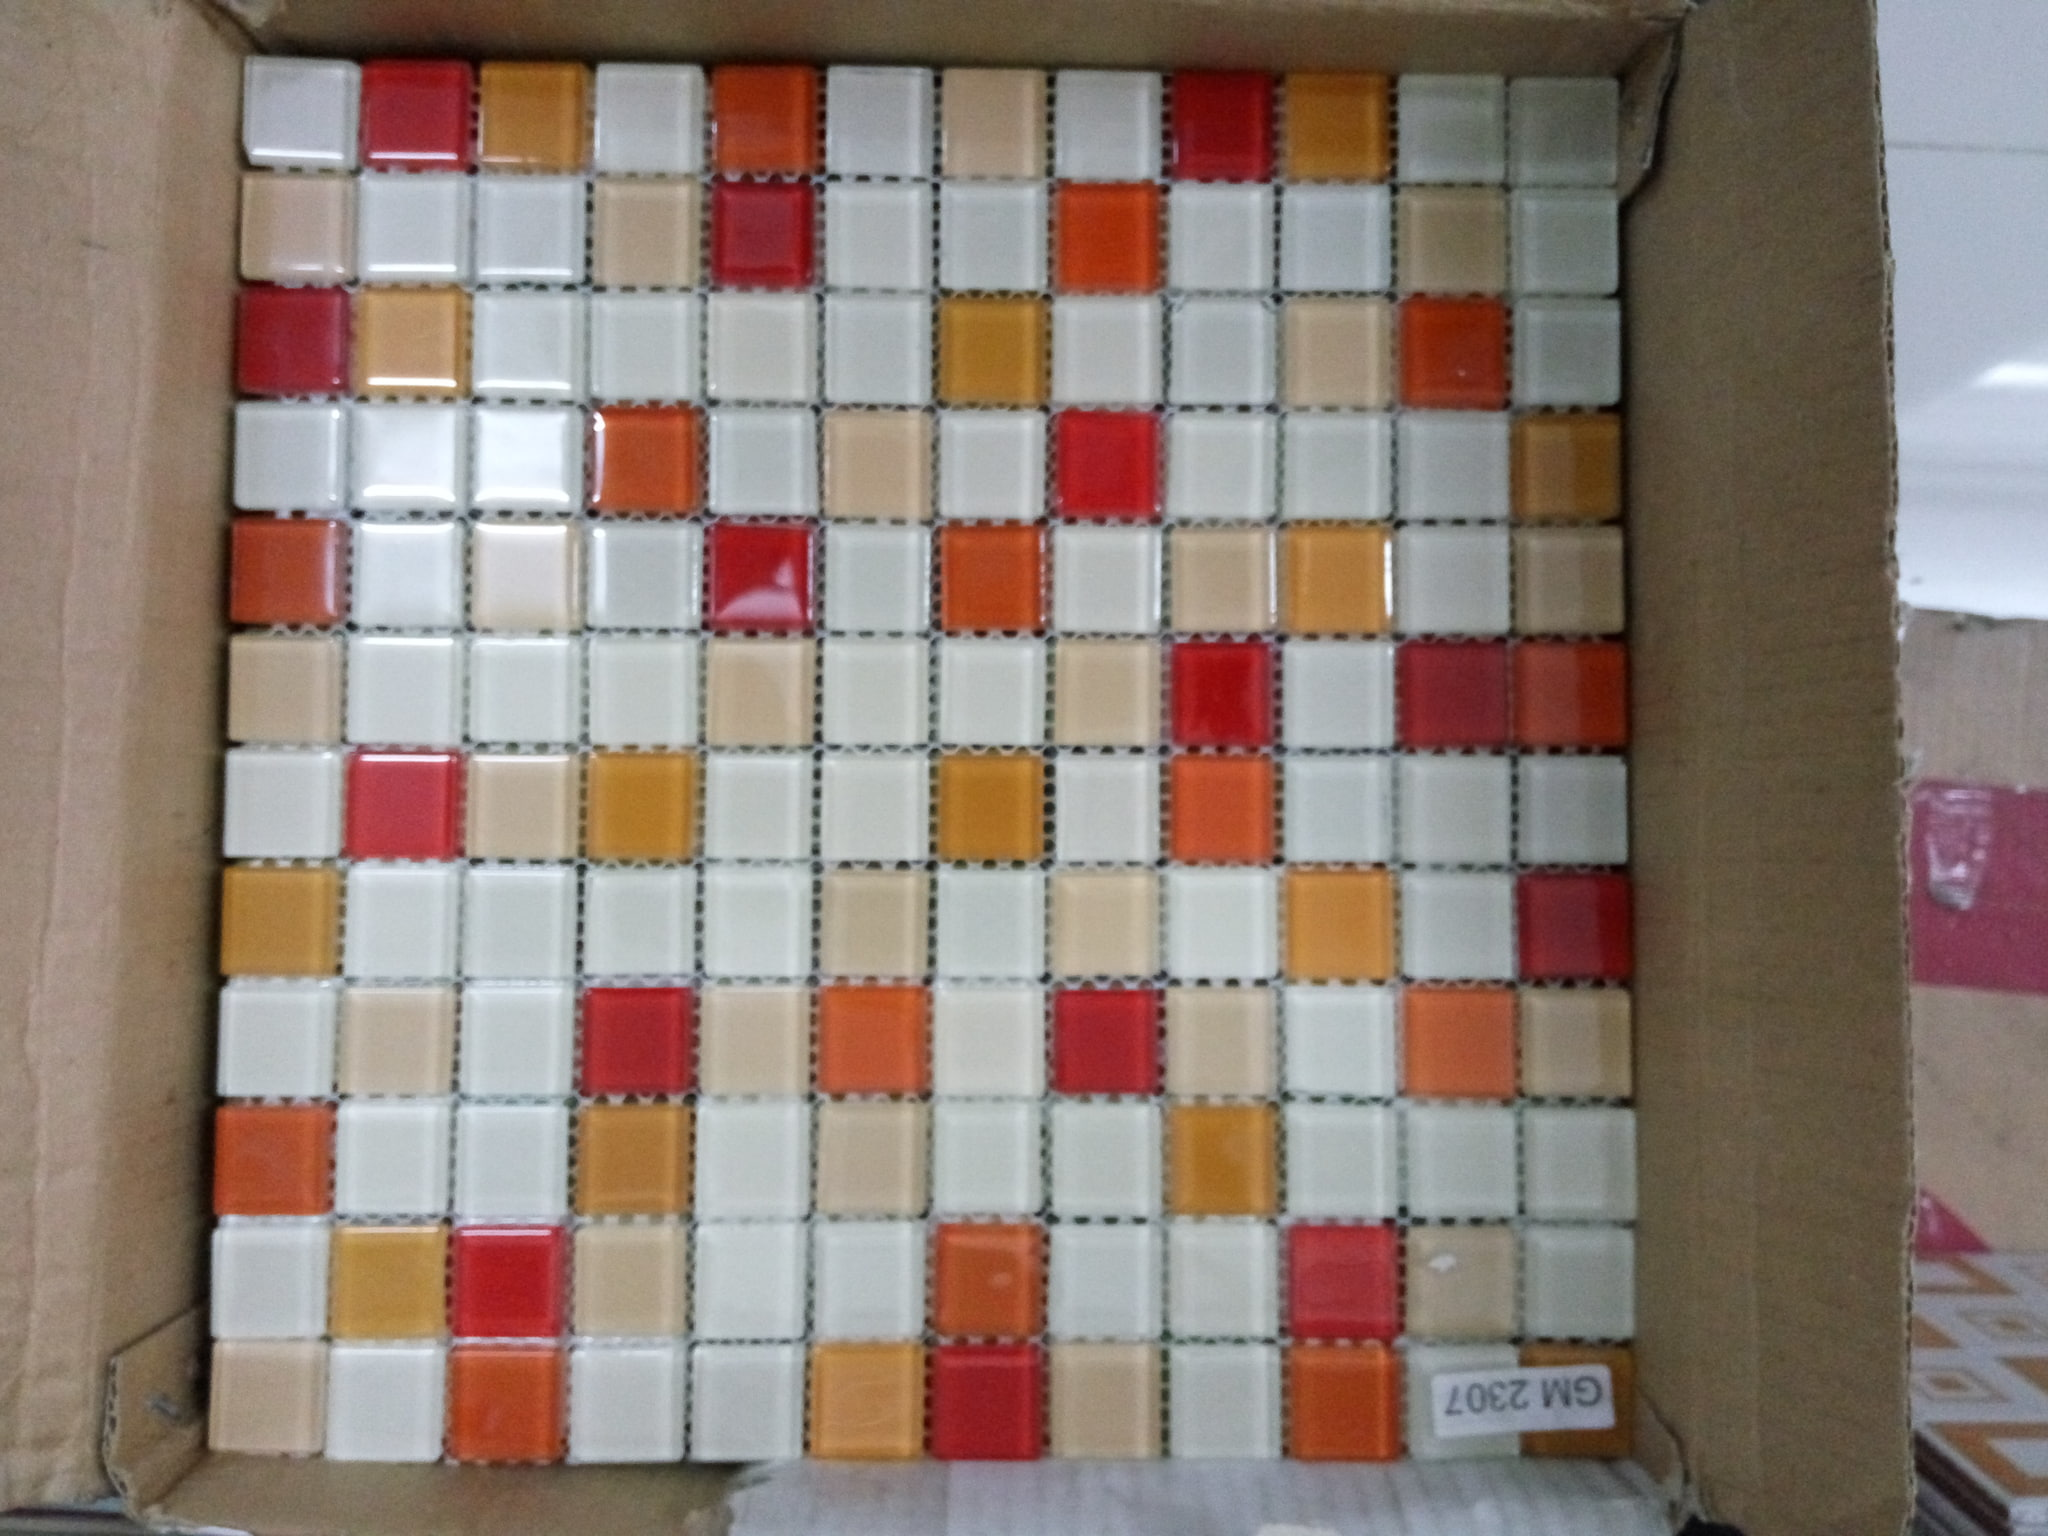 Jual Keramik MOZAIK Dinding 4 Warna Rajawali Keramik Tokopedia